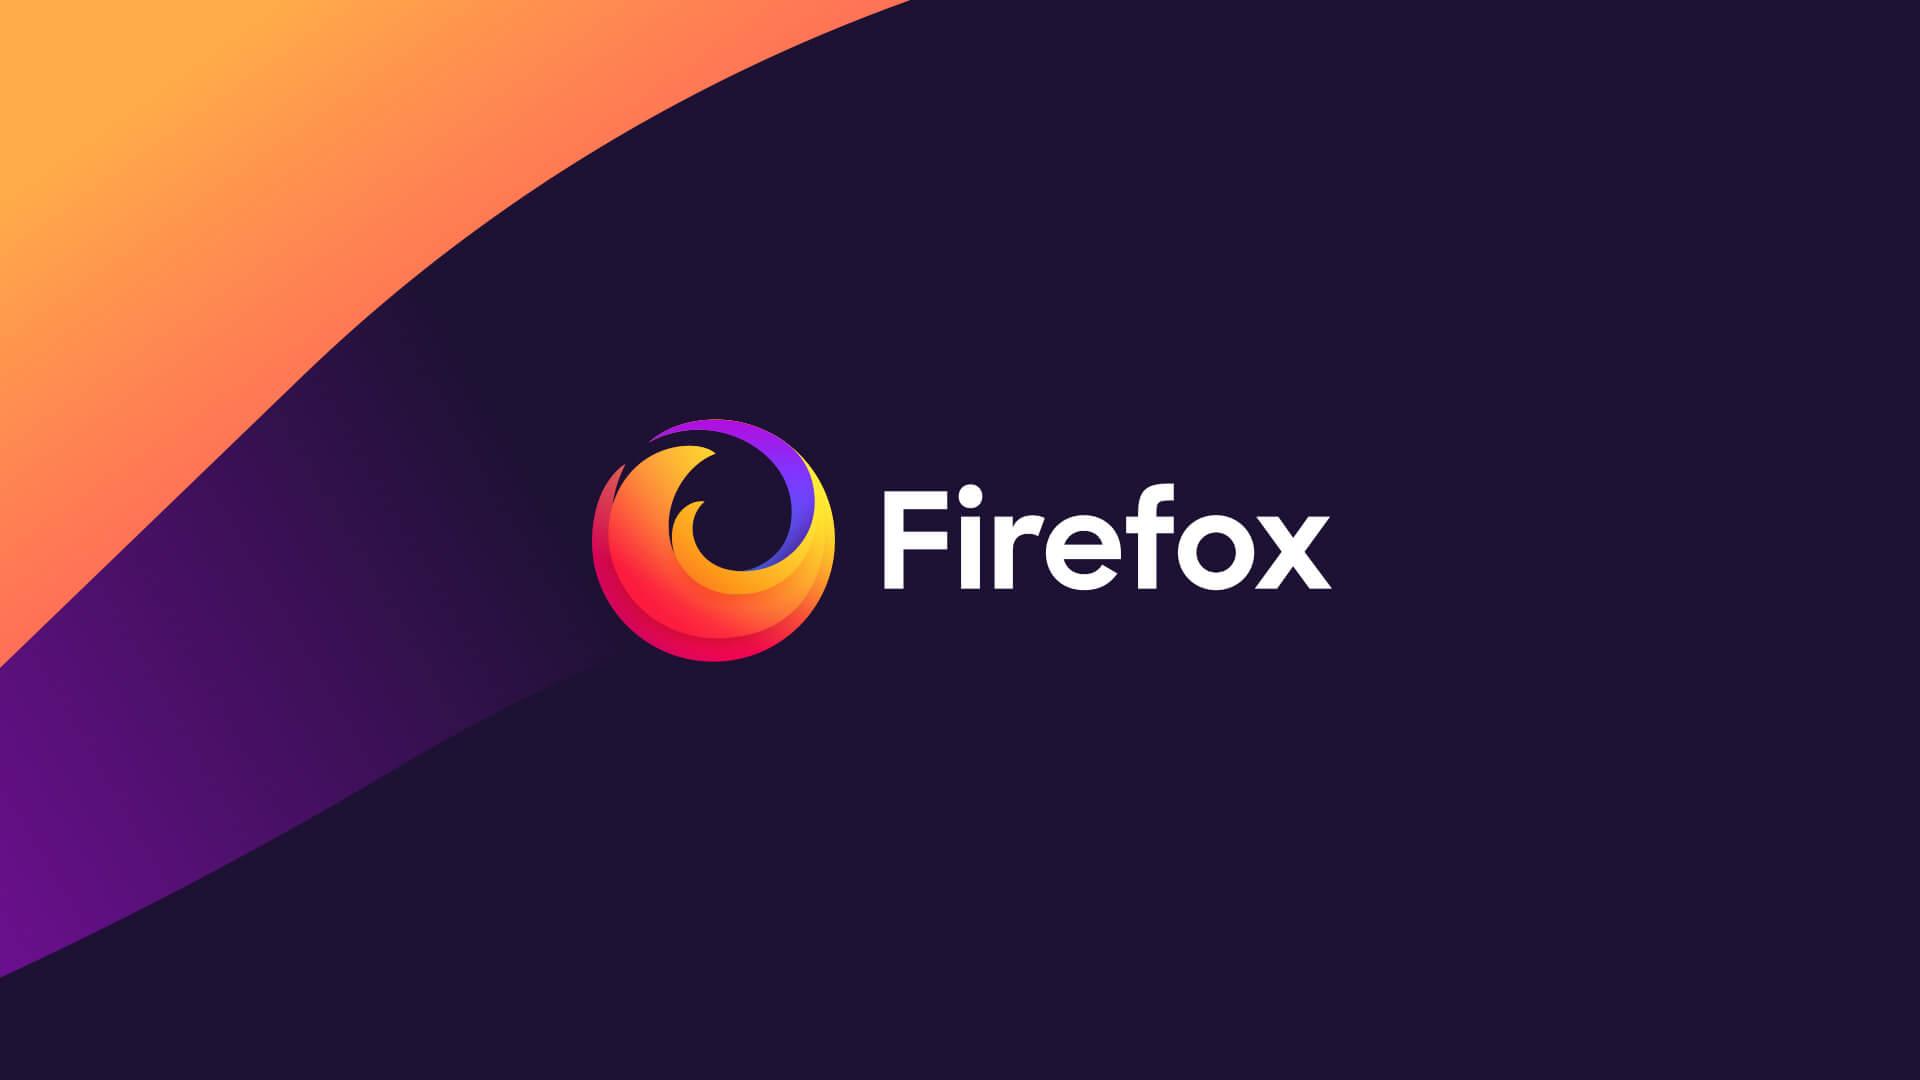 Firefox-free-download-windows